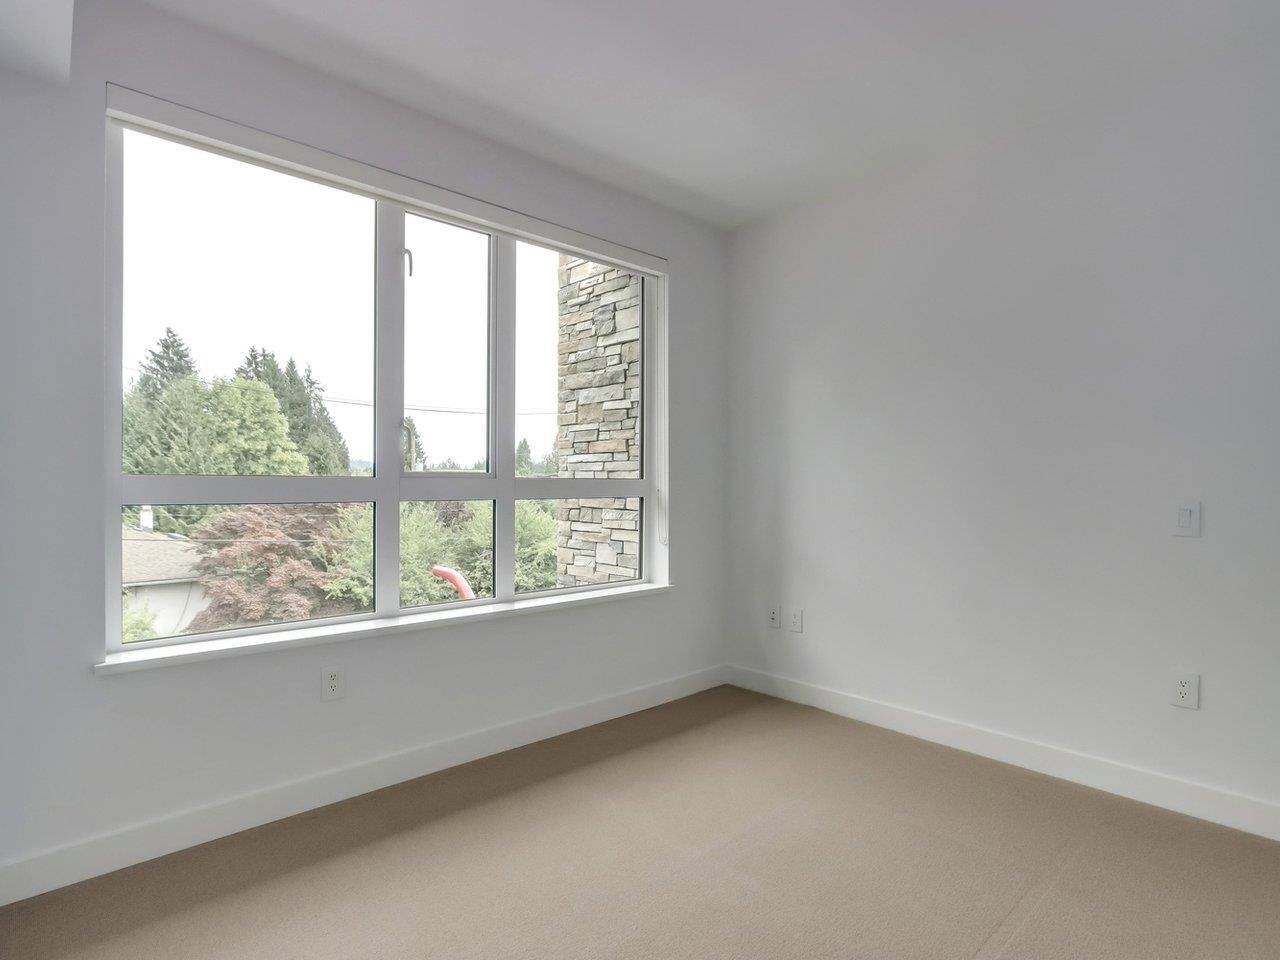 202 1055 RIDGEWOOD DRIVE - Edgemont Townhouse for sale, 3 Bedrooms (R2611487) - #20